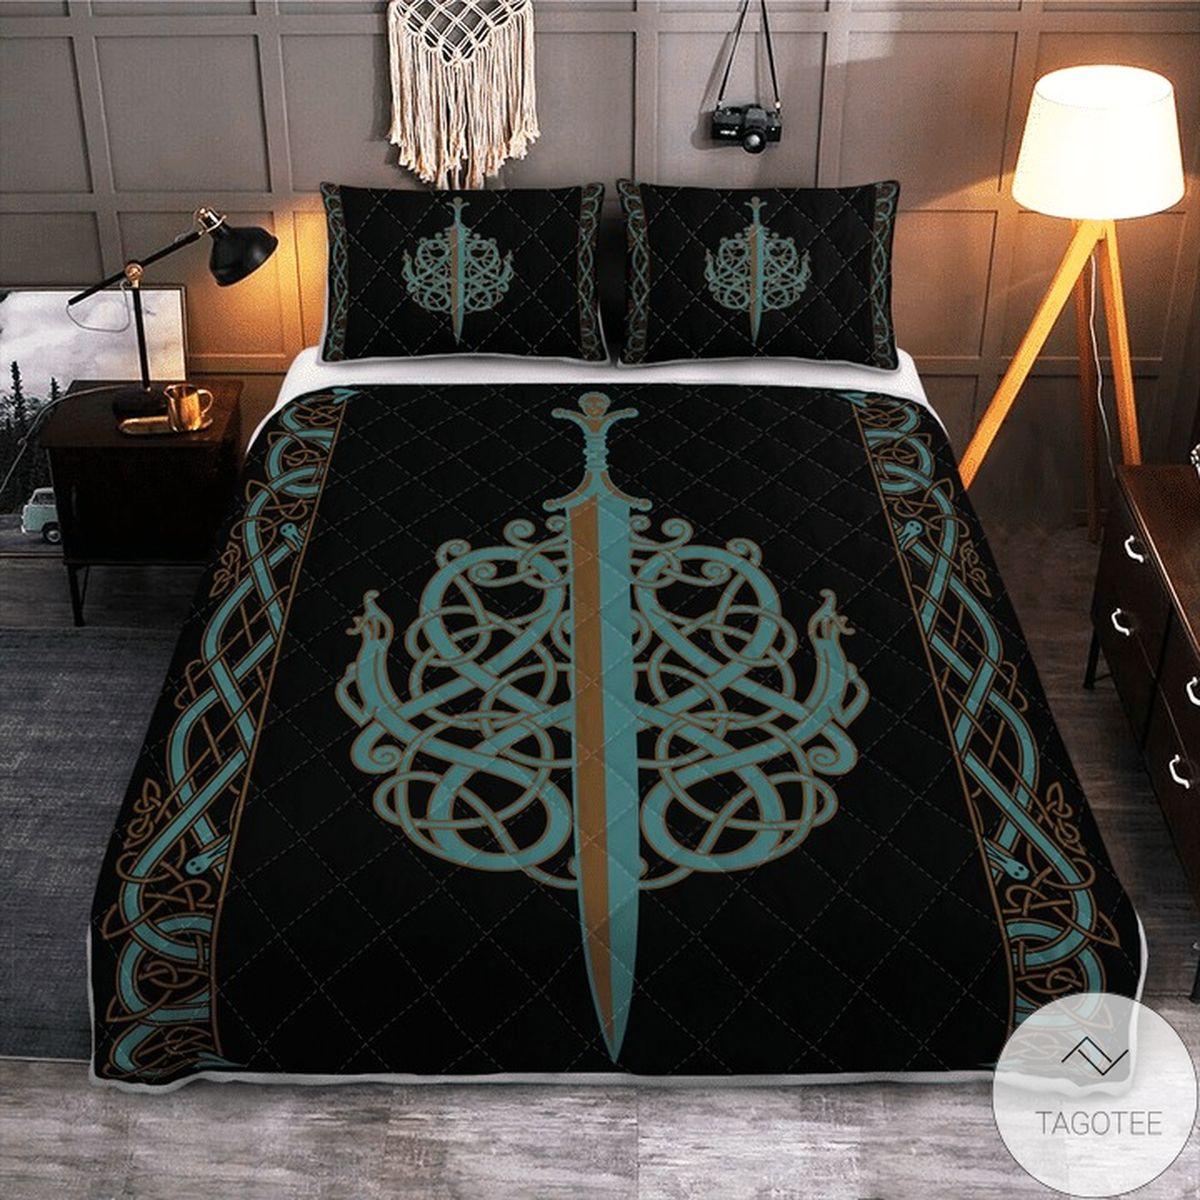 The Ulfberht Swords Viking Quilt Bedding Set